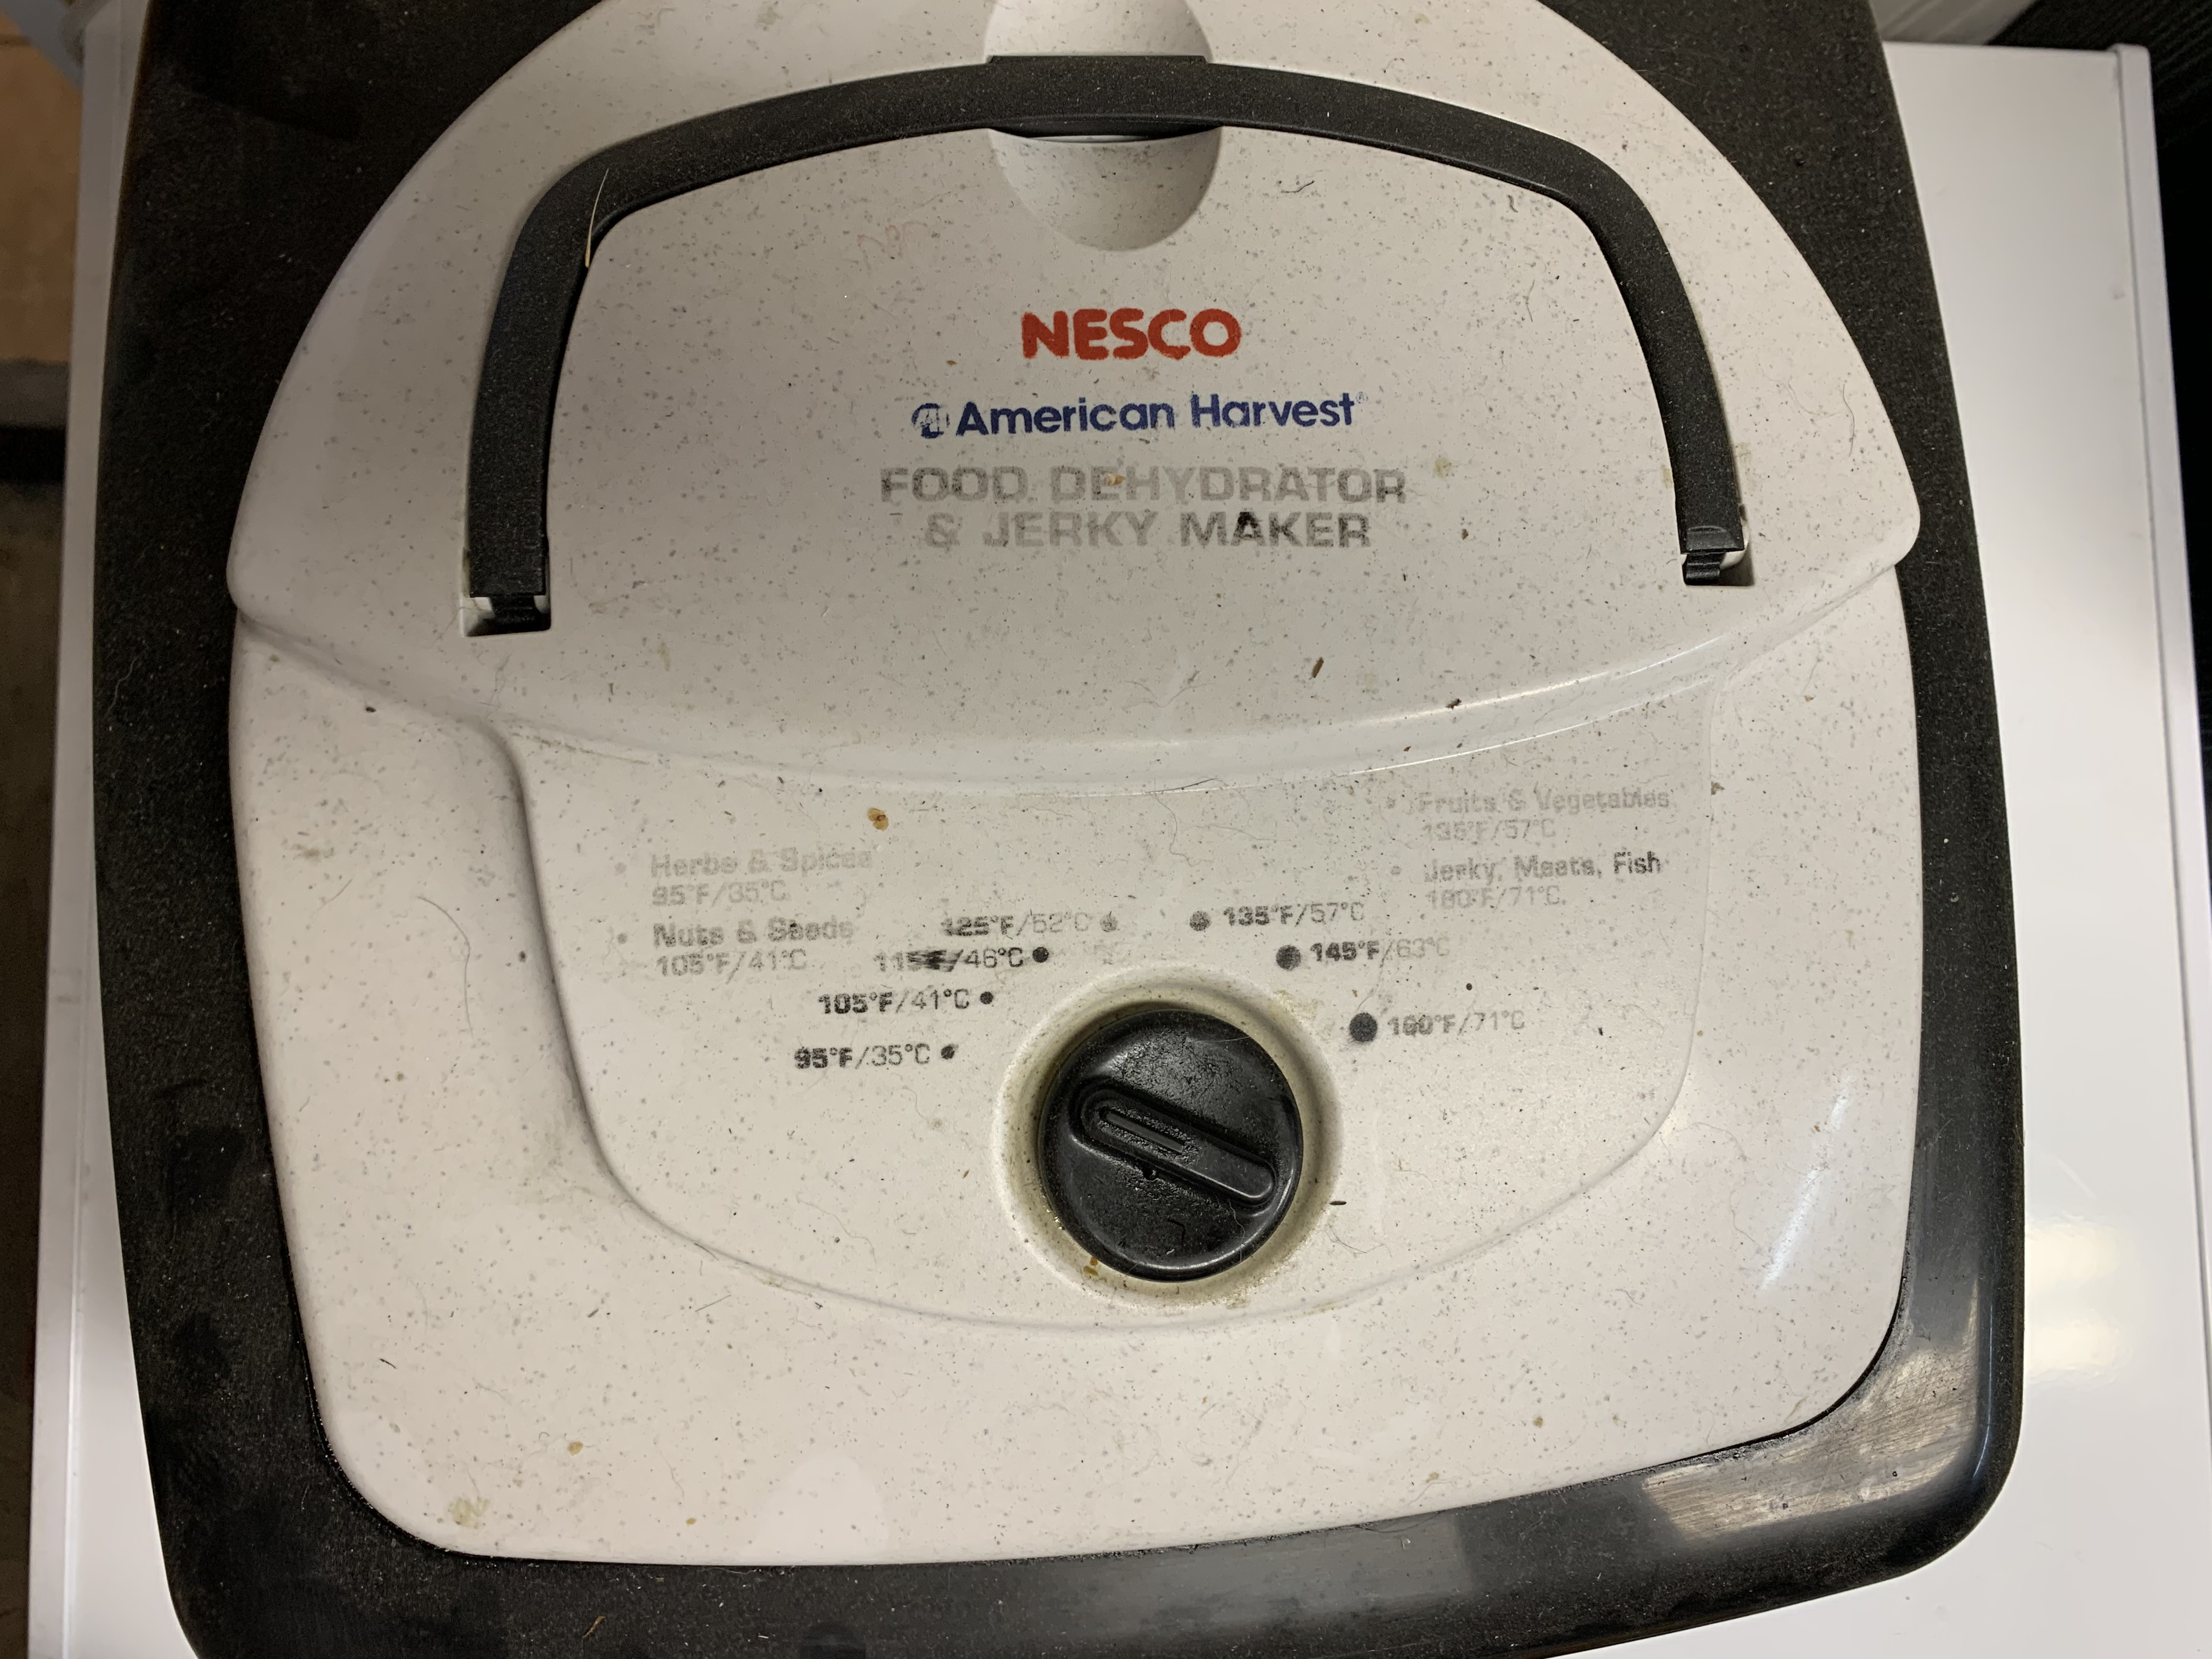 biltong in a nesco dehydrator